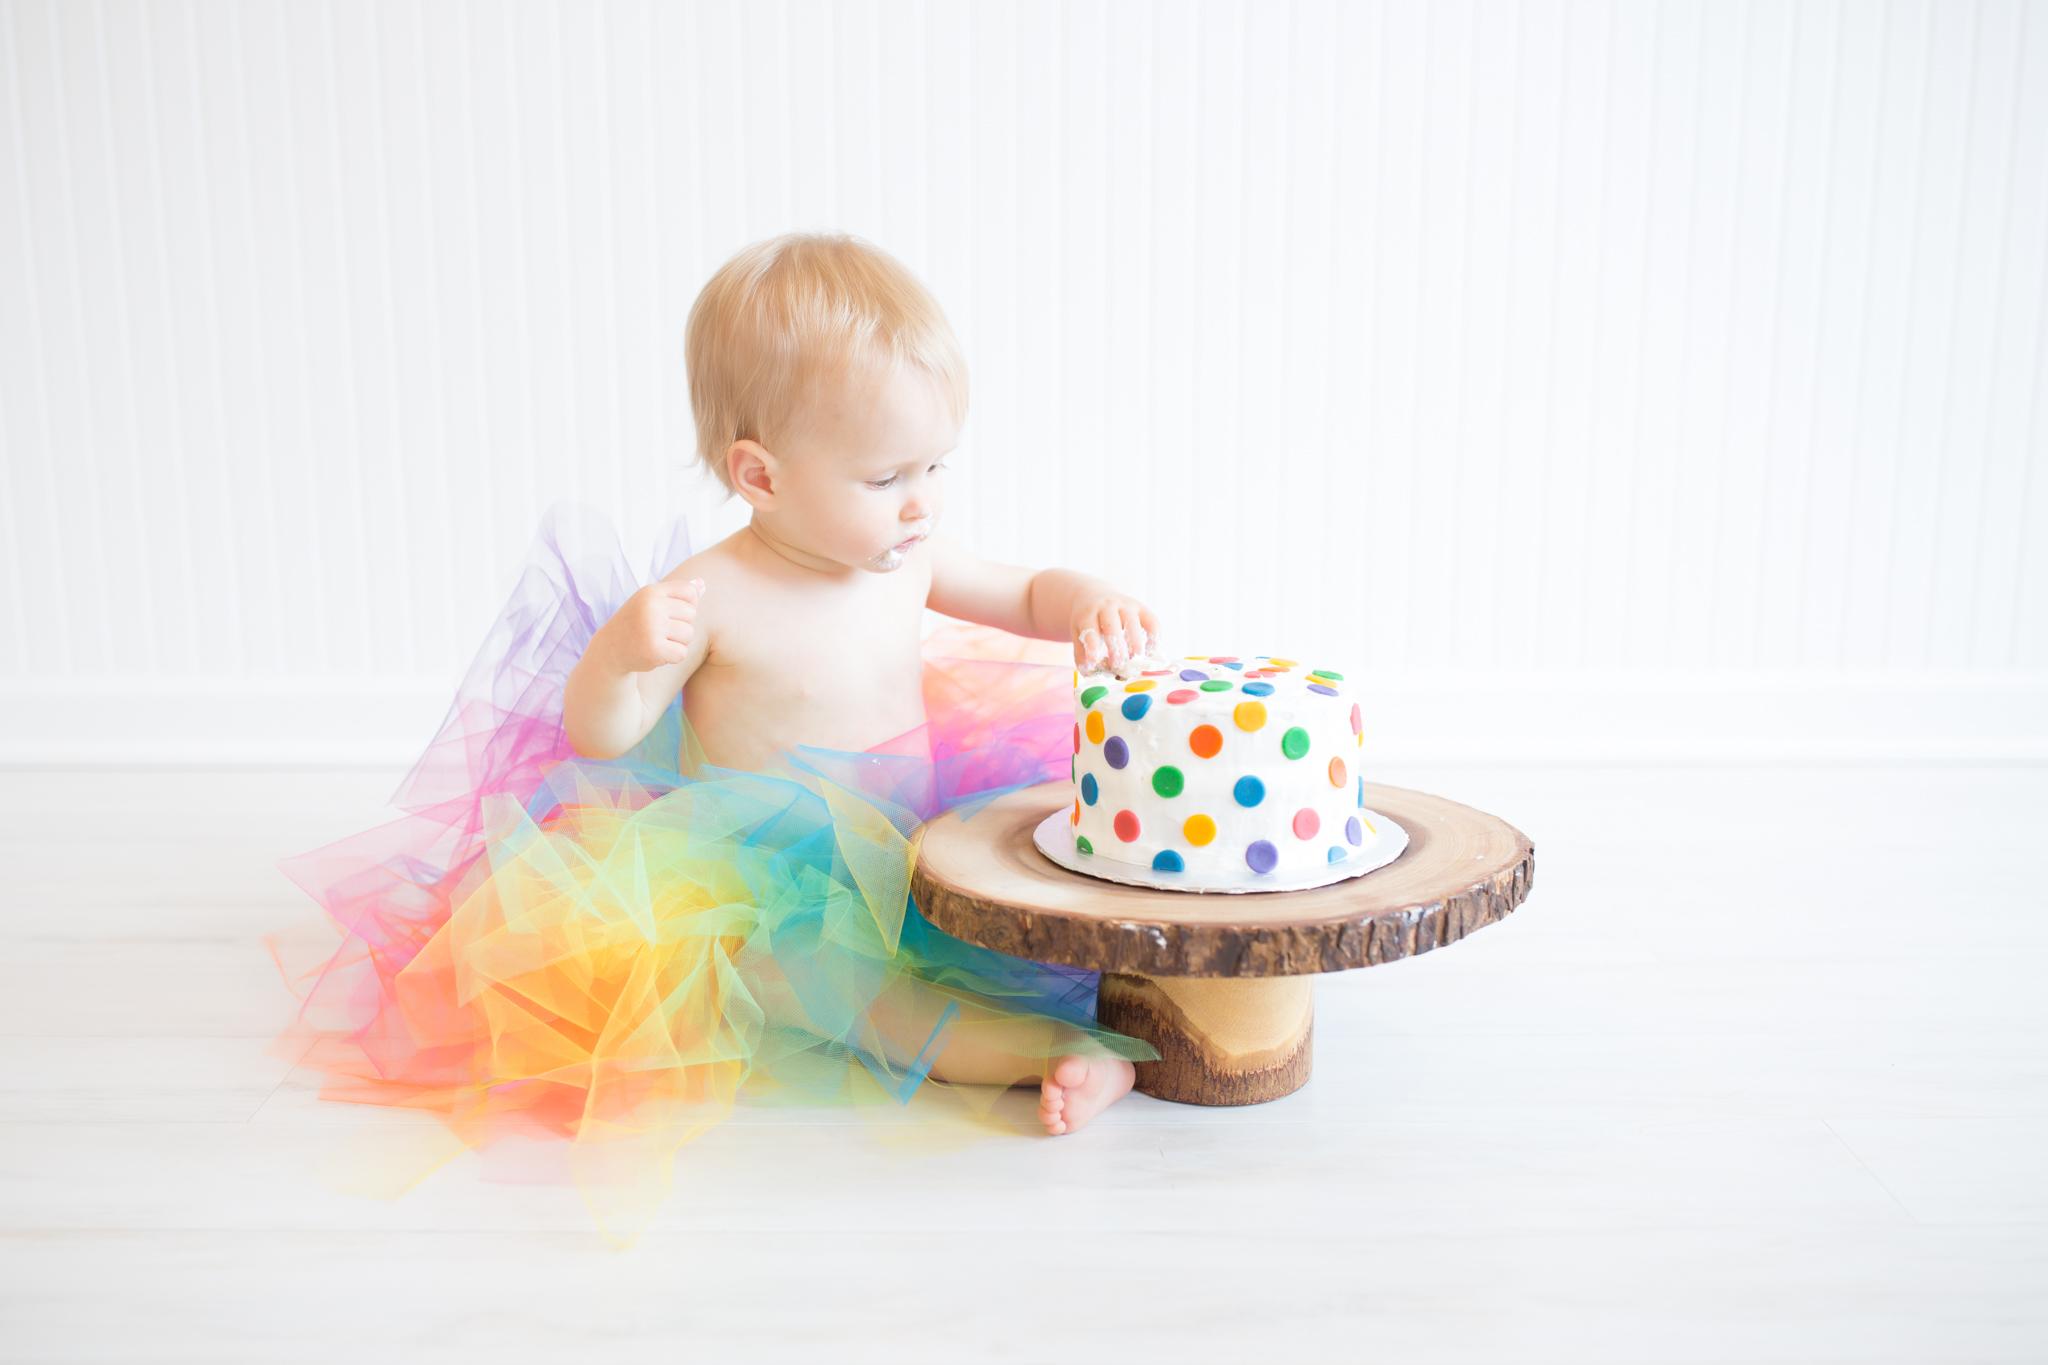 Milestone cake smash Newborn Studio Session | Cara Peterson Photography Rockford IL-10.jpg